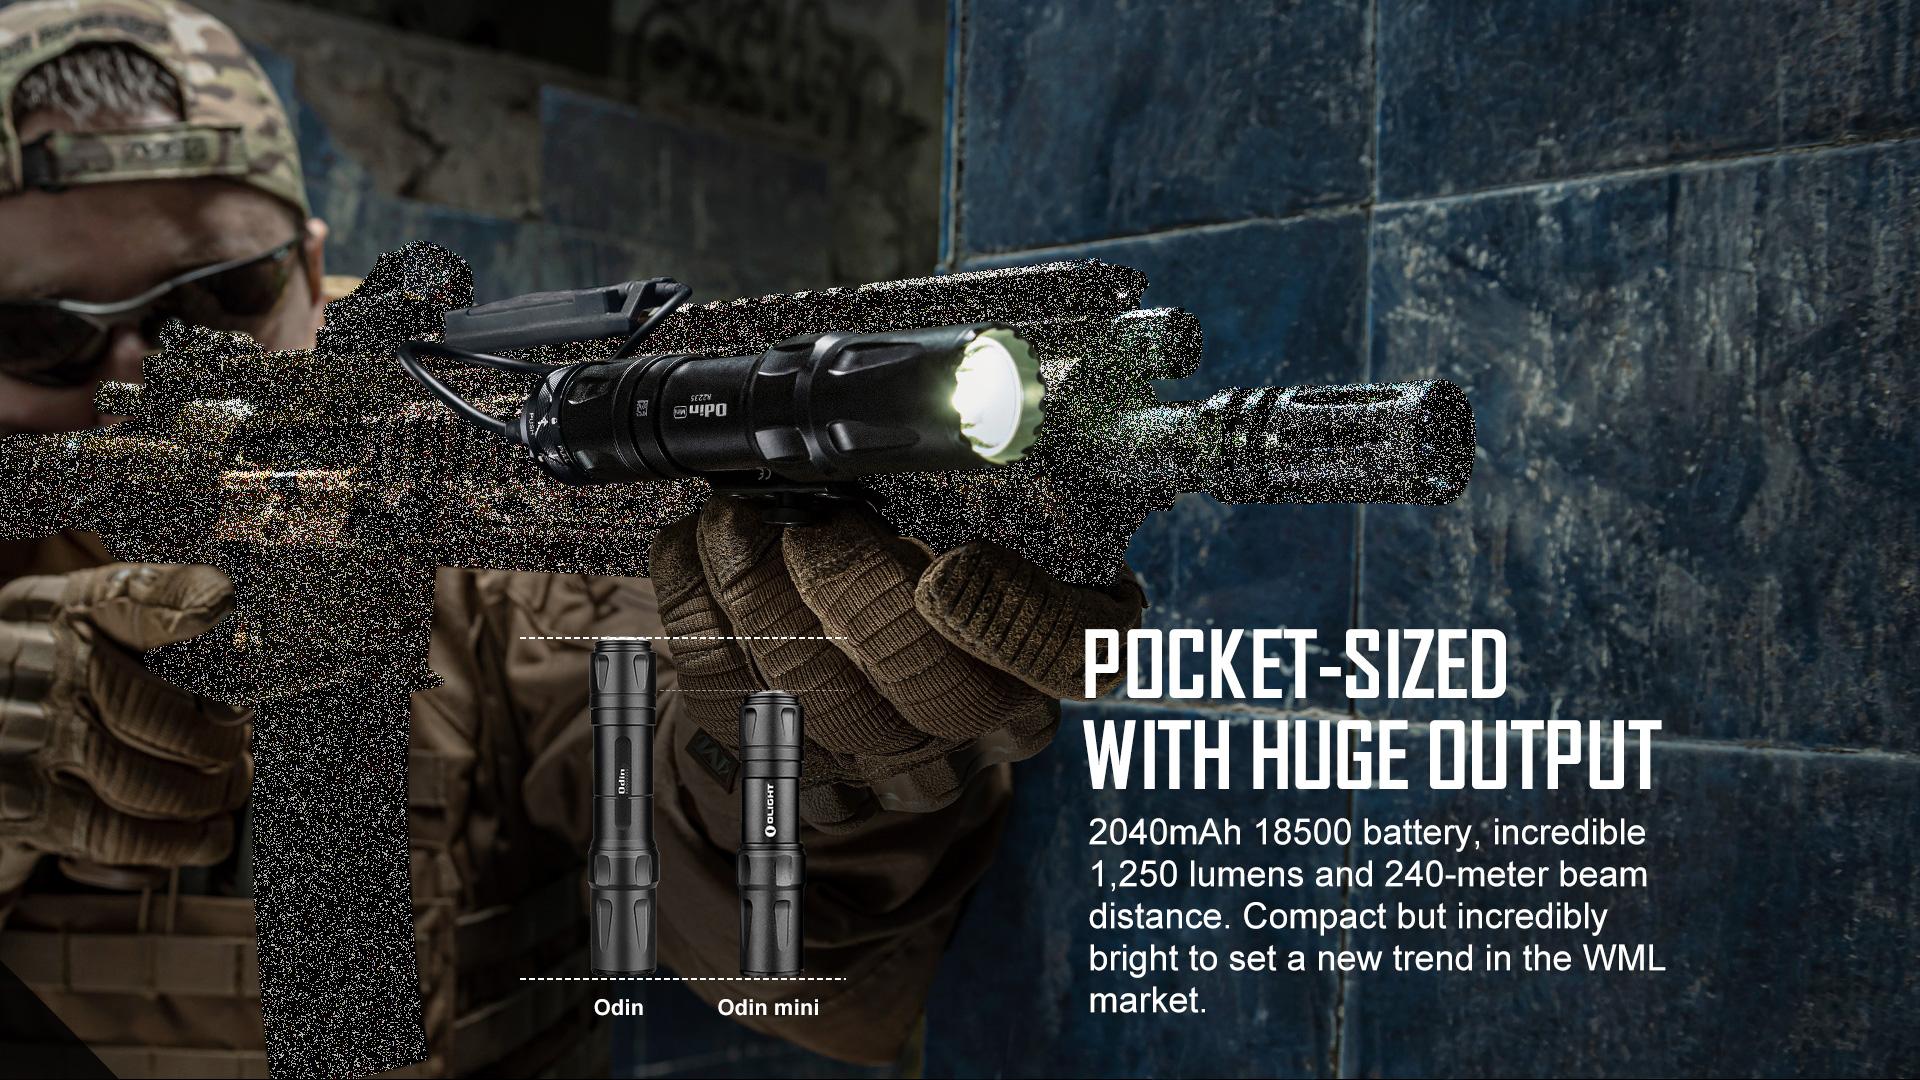 Olight Odin Mini Small Tactical Flashlight Small but Powerful